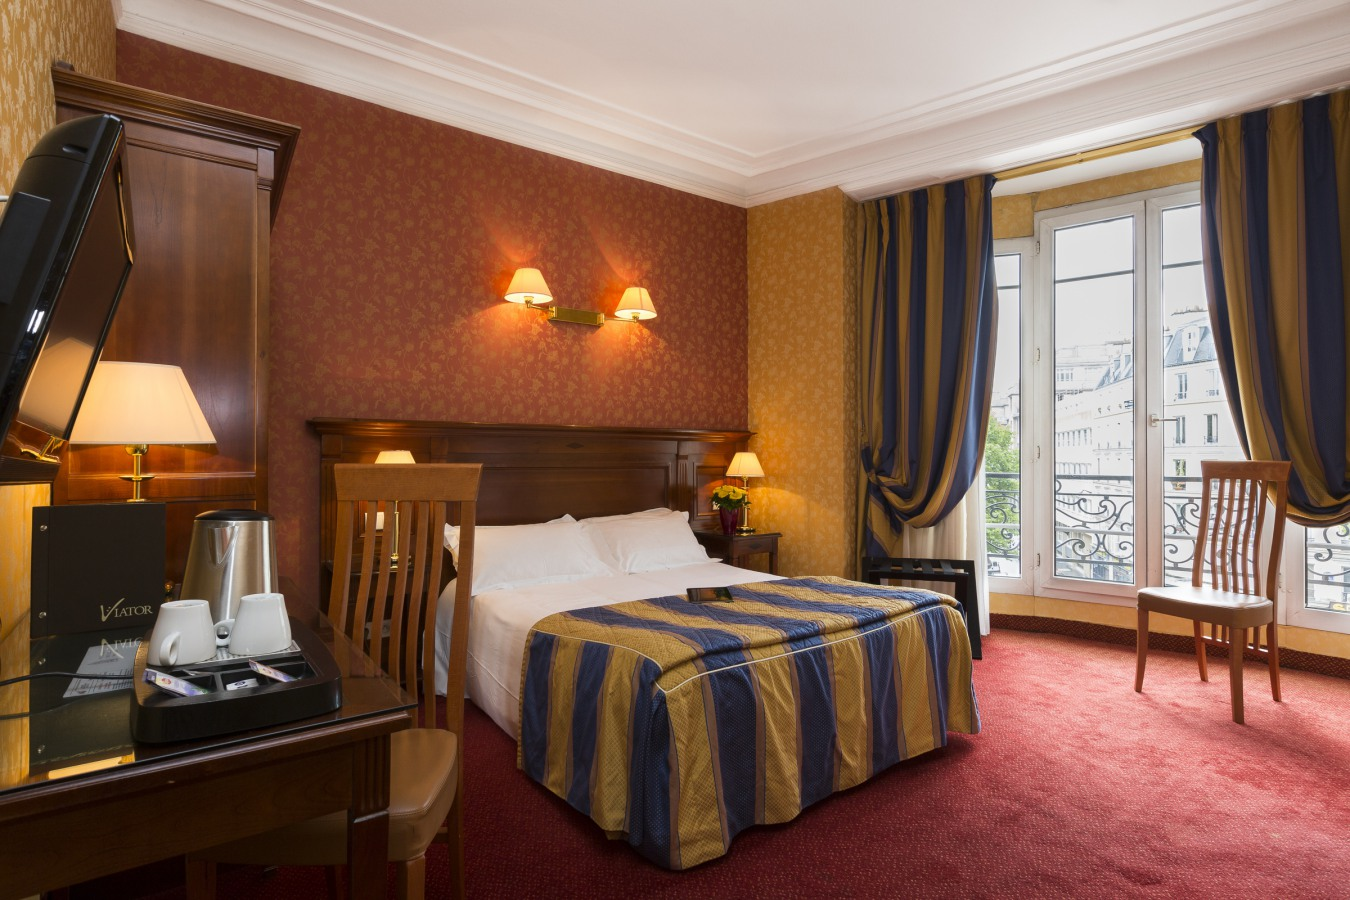 hotel luxe strasbourg location avec cuisine quip e droit locataire. Black Bedroom Furniture Sets. Home Design Ideas